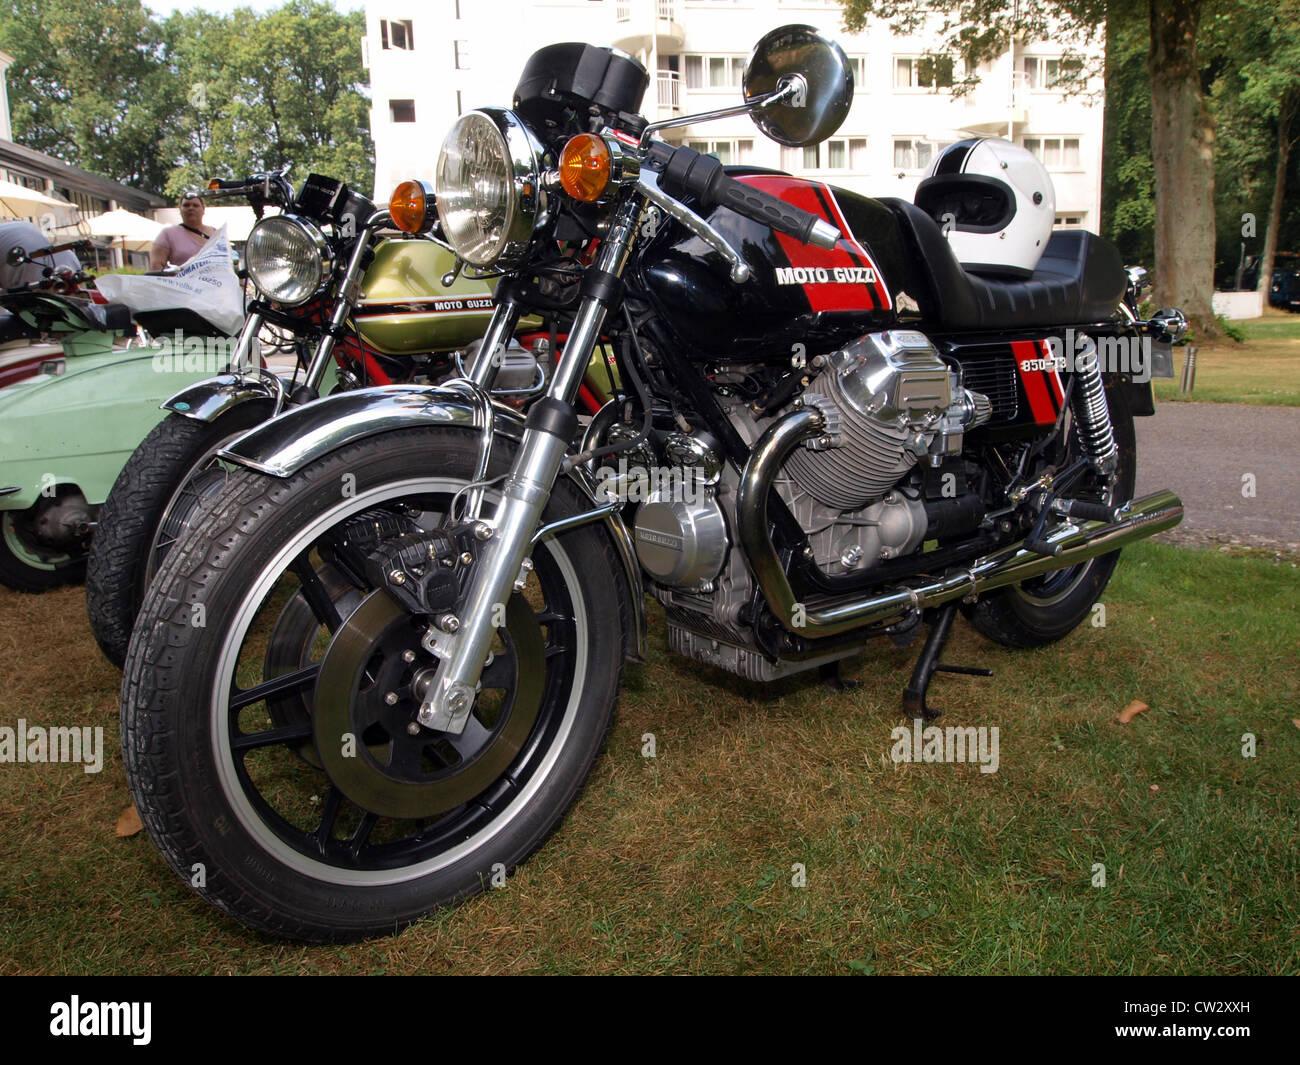 moto guzzi 850 t3 banque d 39 images photo stock 49852169. Black Bedroom Furniture Sets. Home Design Ideas